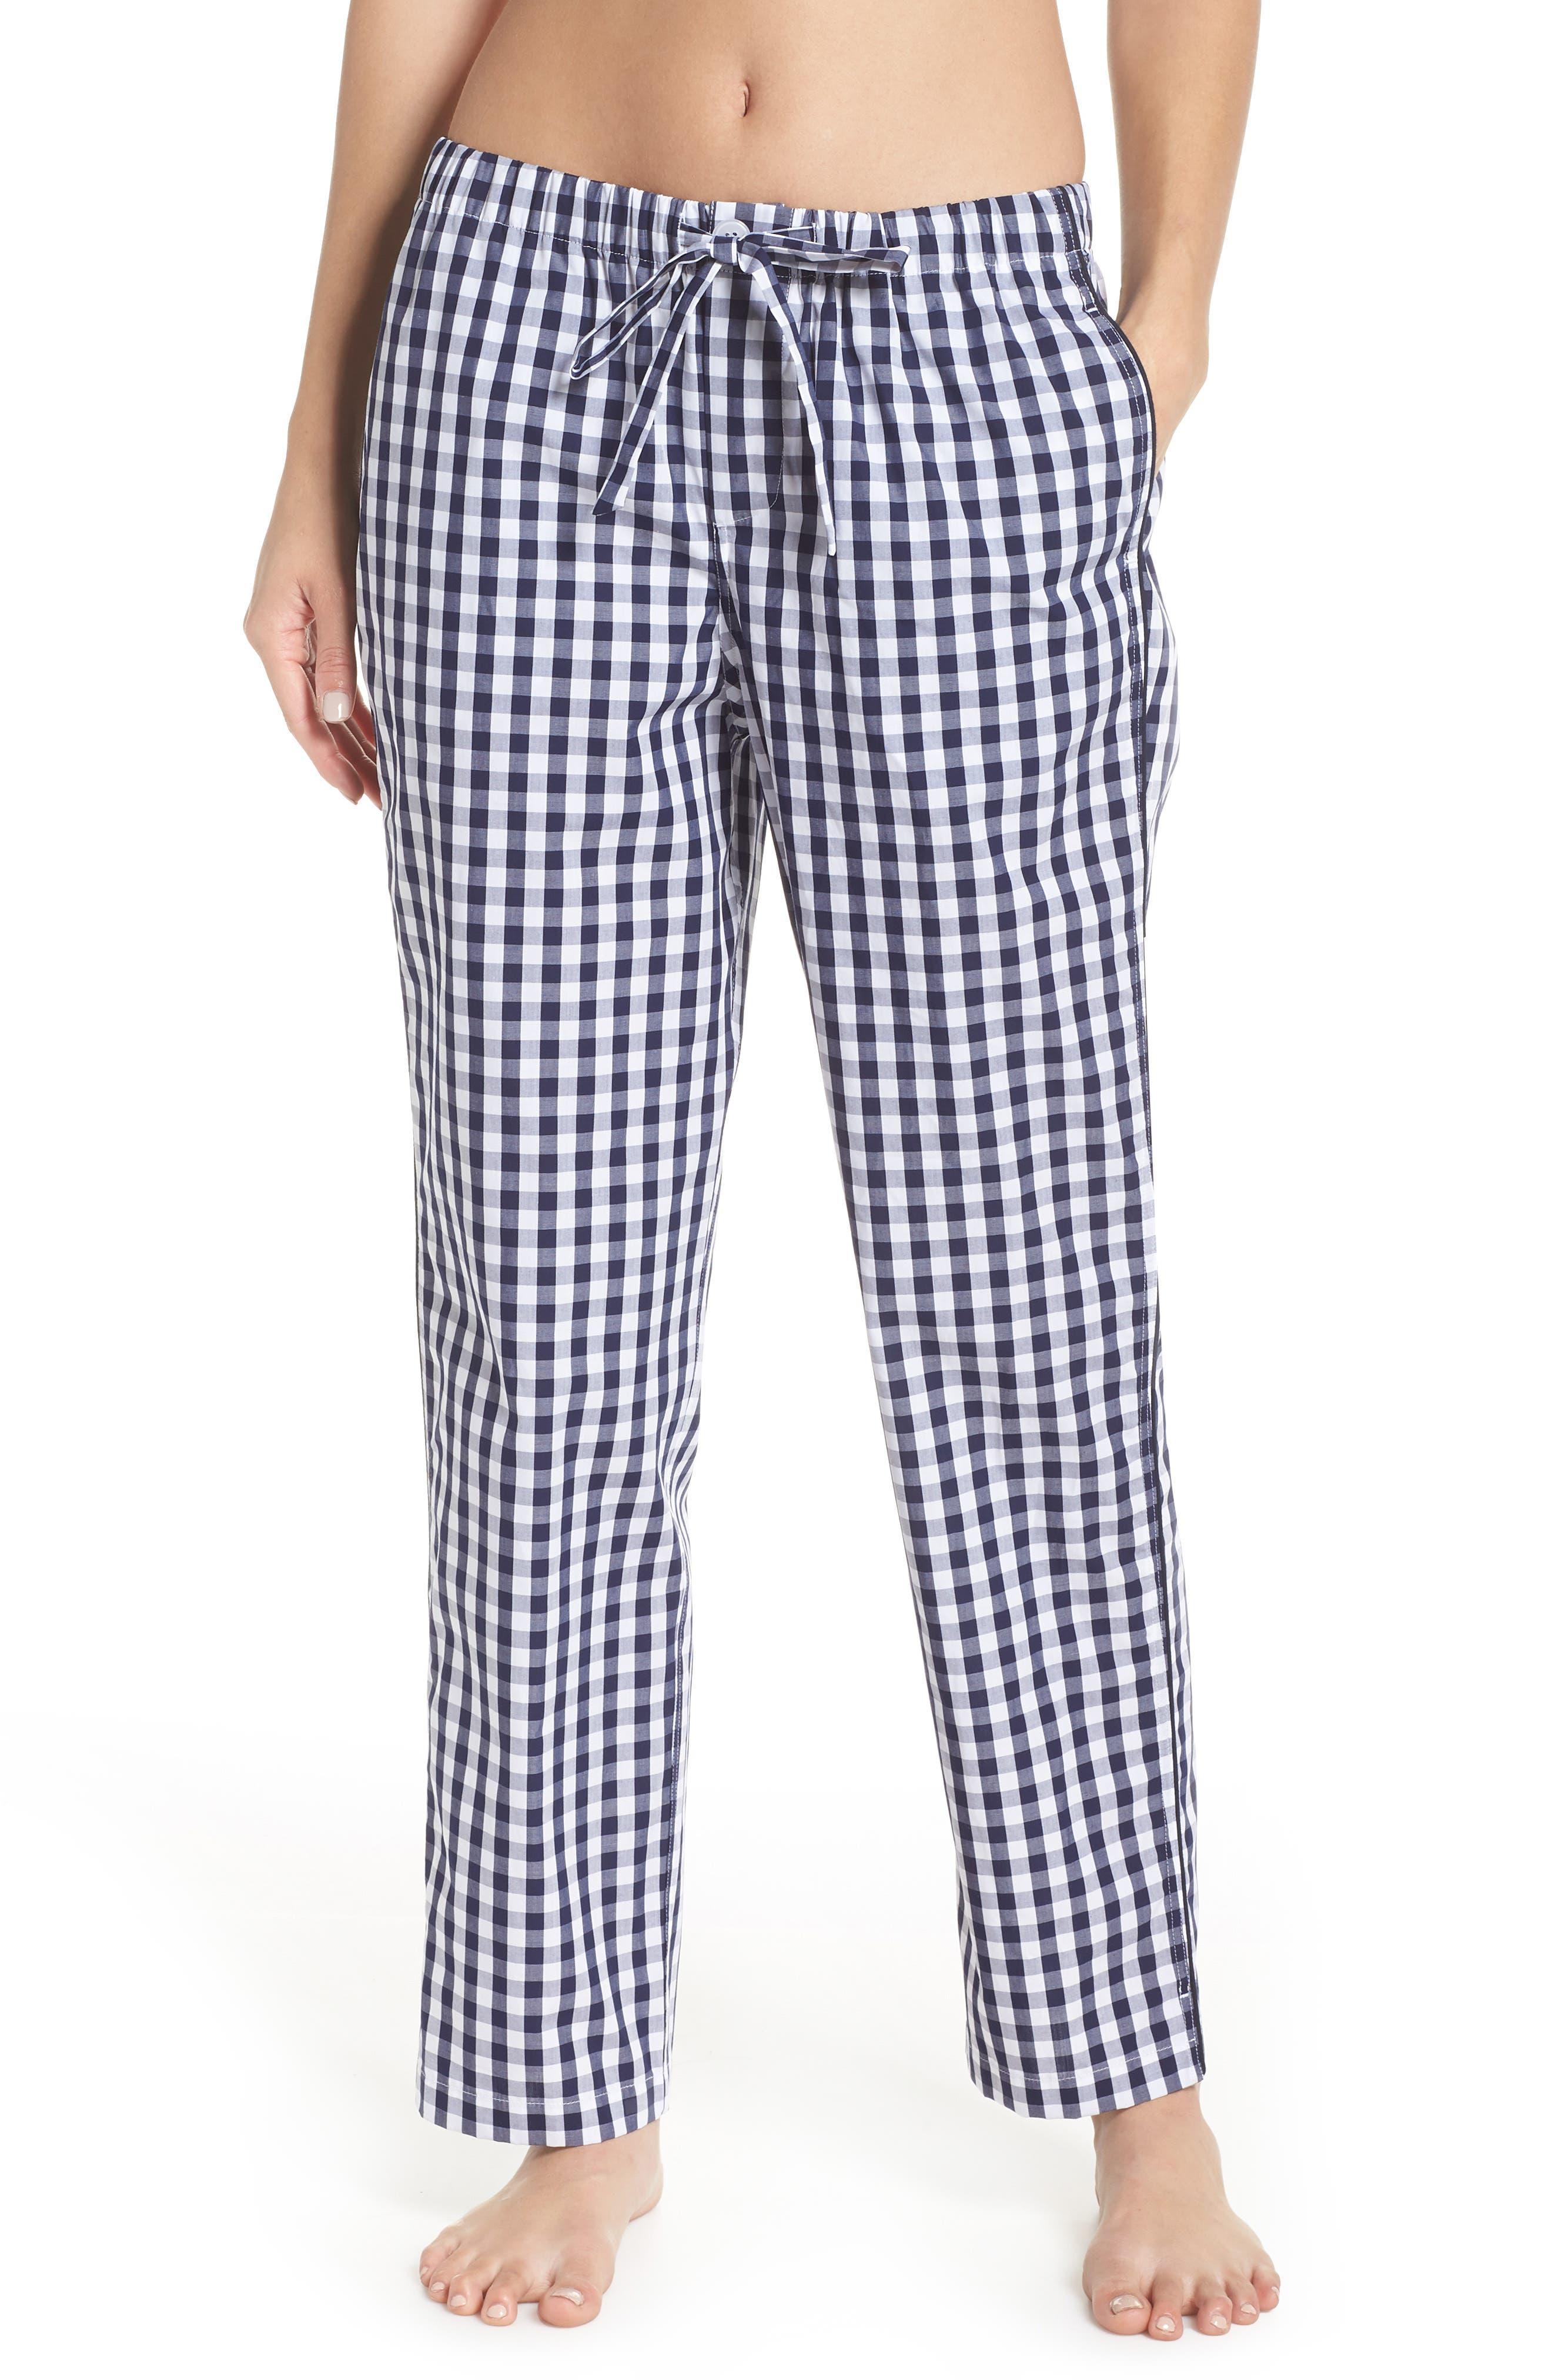 Marina Women's Pajama Pants,                             Alternate thumbnail 2, color,                             LARGE GINGHAM BLUE